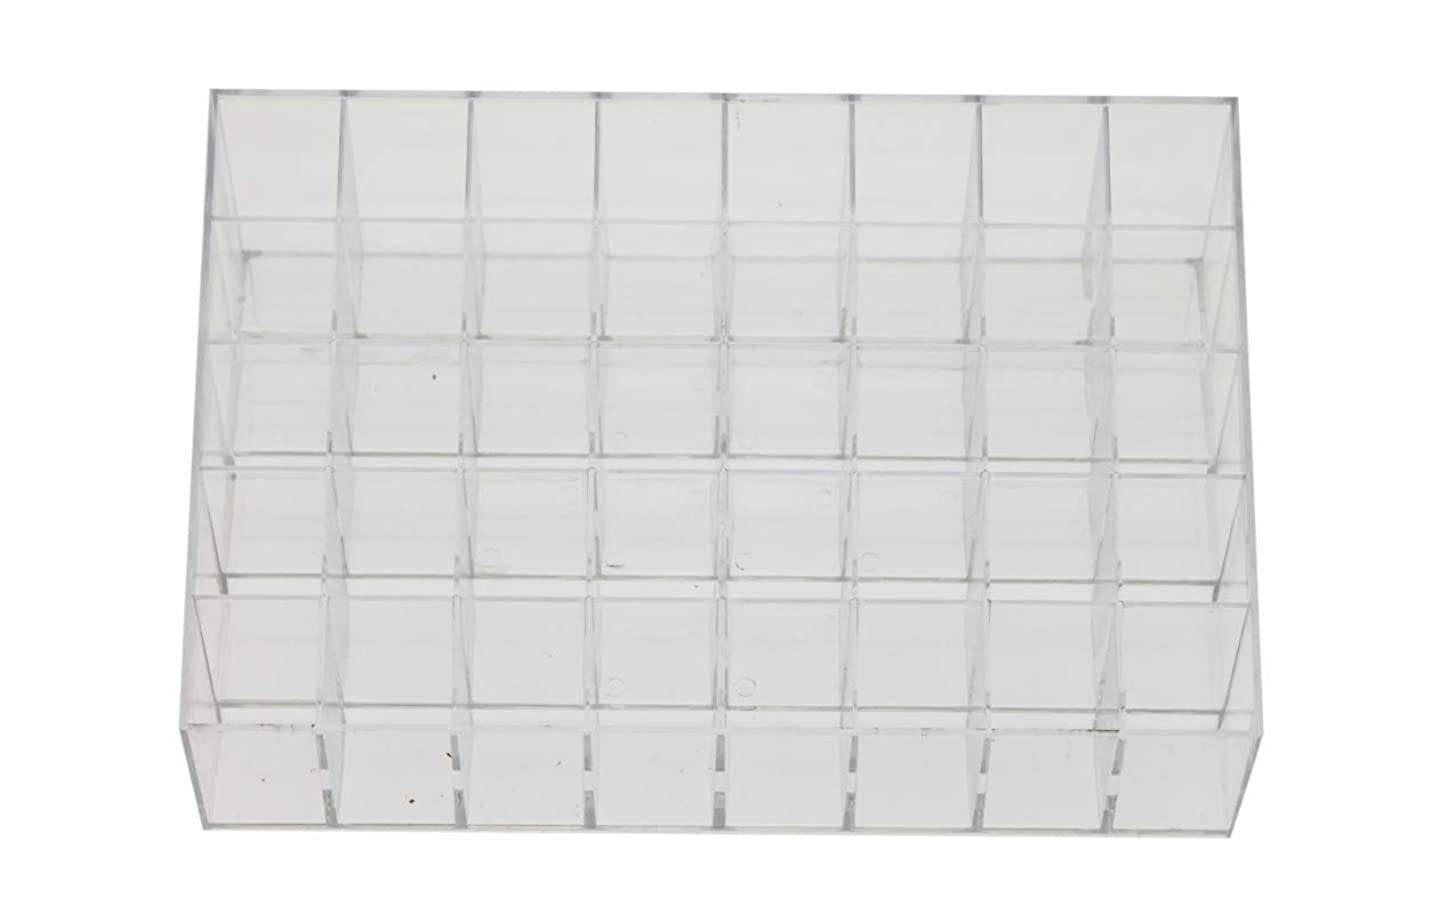 Olive-G アクリル コスメ 収納 ケース スタンド 化粧品 メイク 口紅 リップ 小物入れ 透明 40本